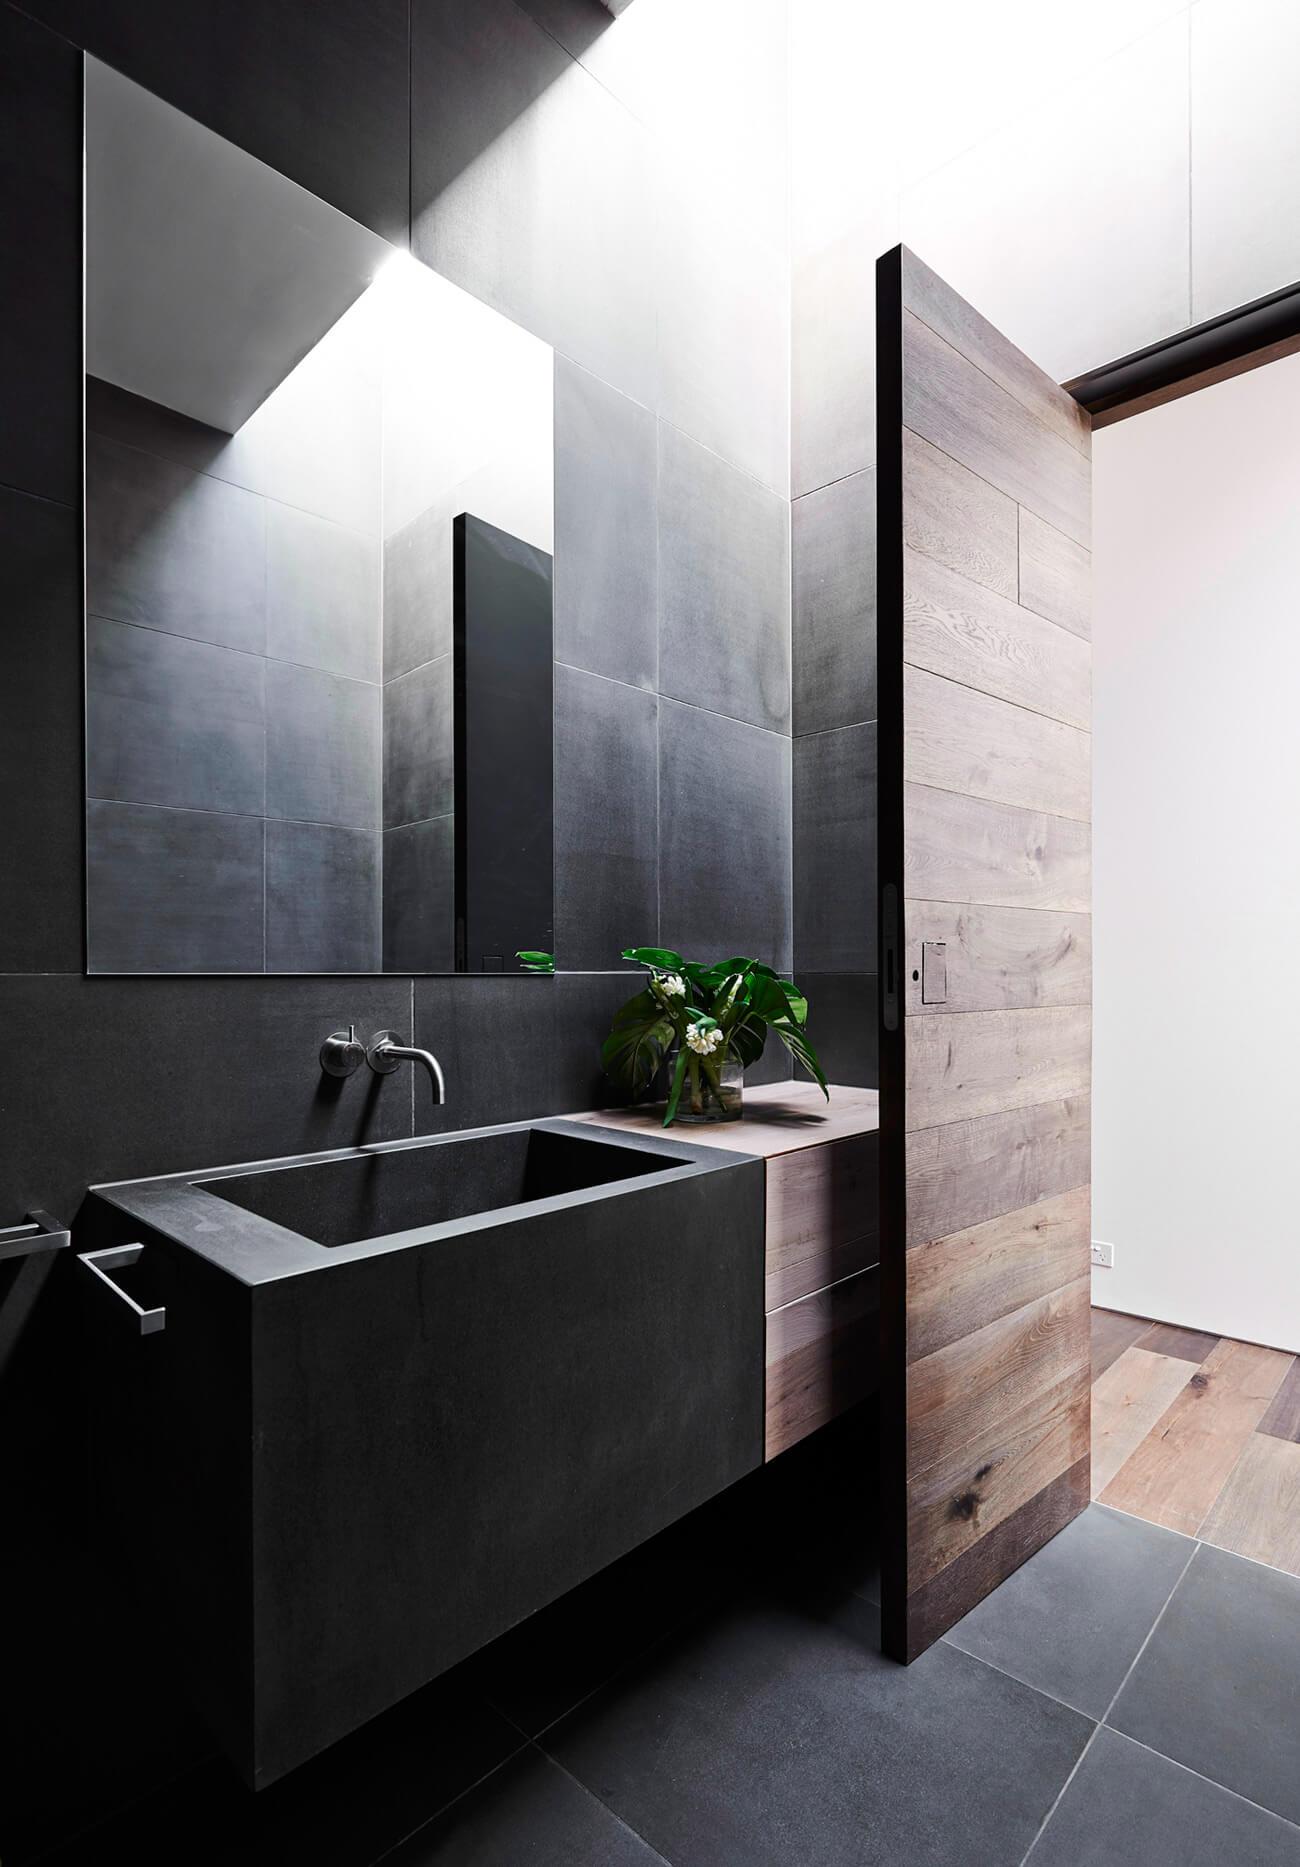 016 House Malvern Robson Rak Architects Homeadore